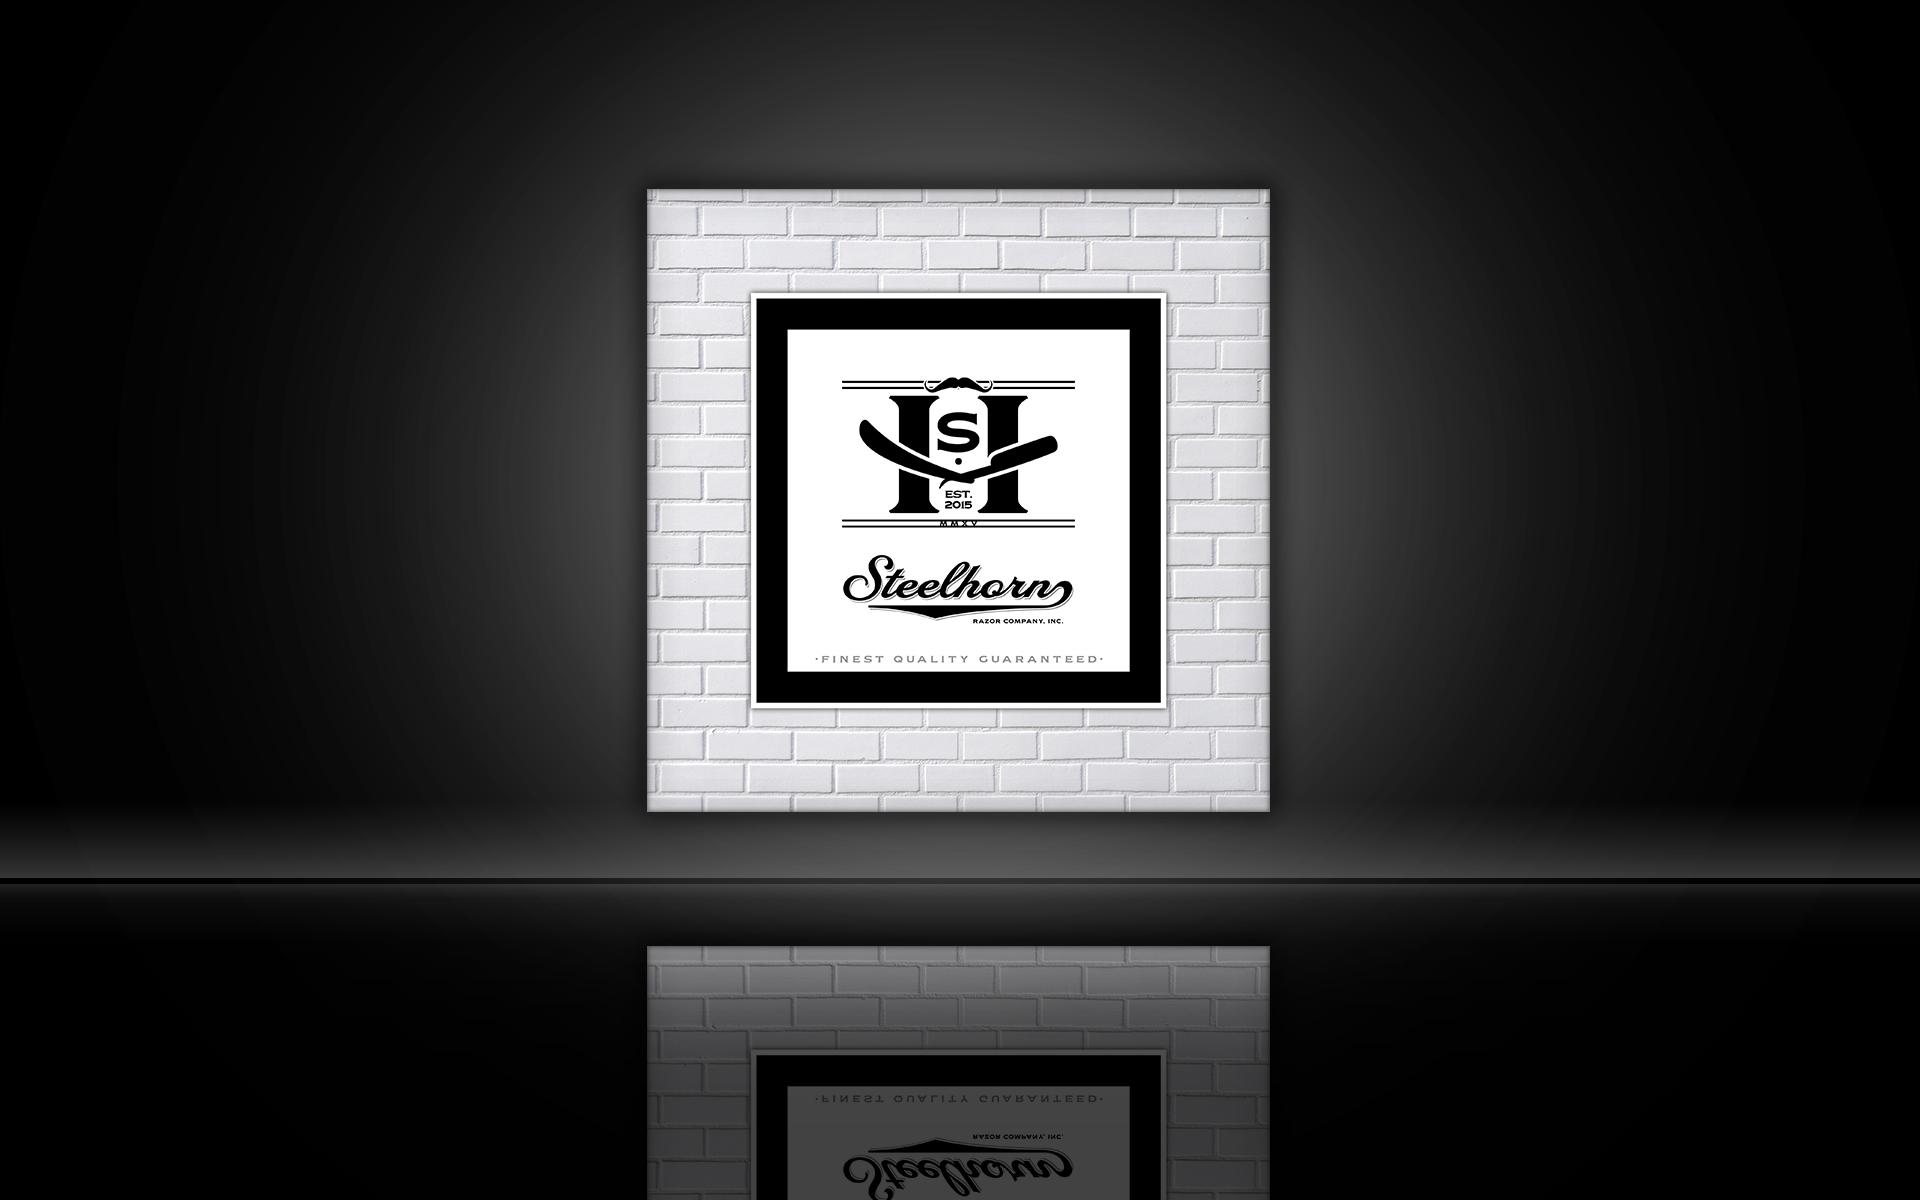 Steelhorn Razor Company Logo by Graham Hnedak Brand G Creative 01 SEPT 2015.jpg